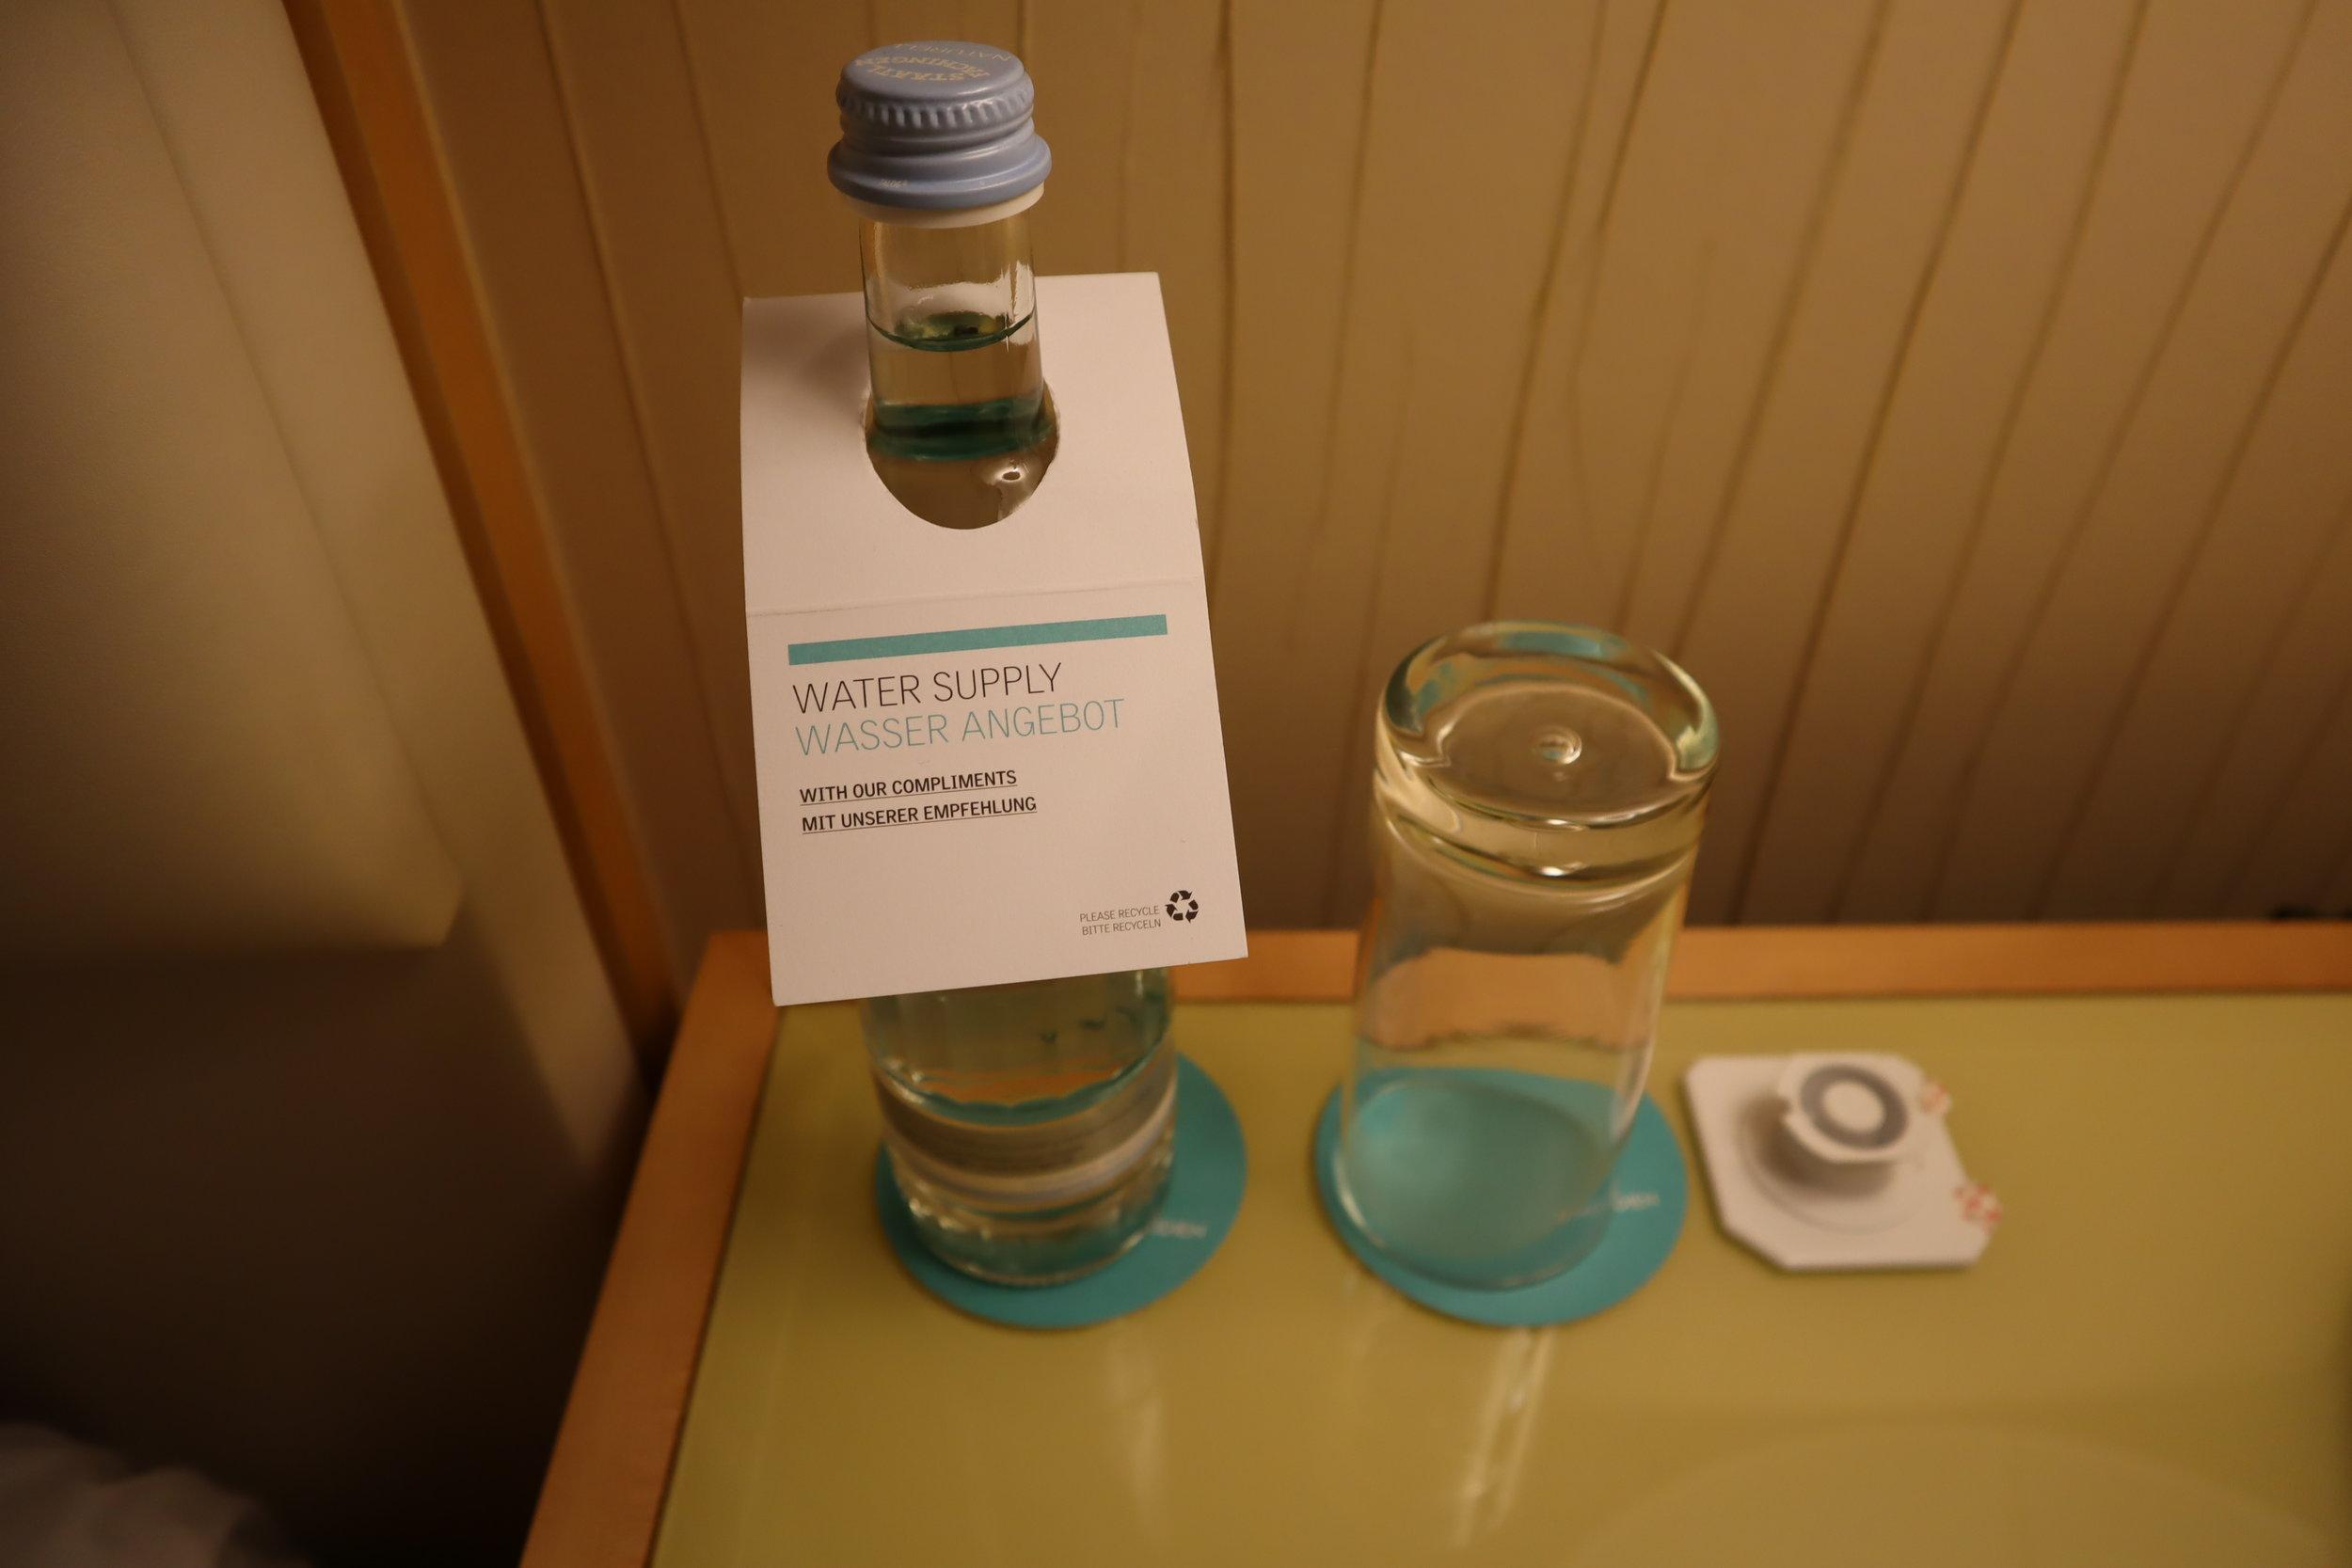 Le Méridien Munich – Complimentary bottled water